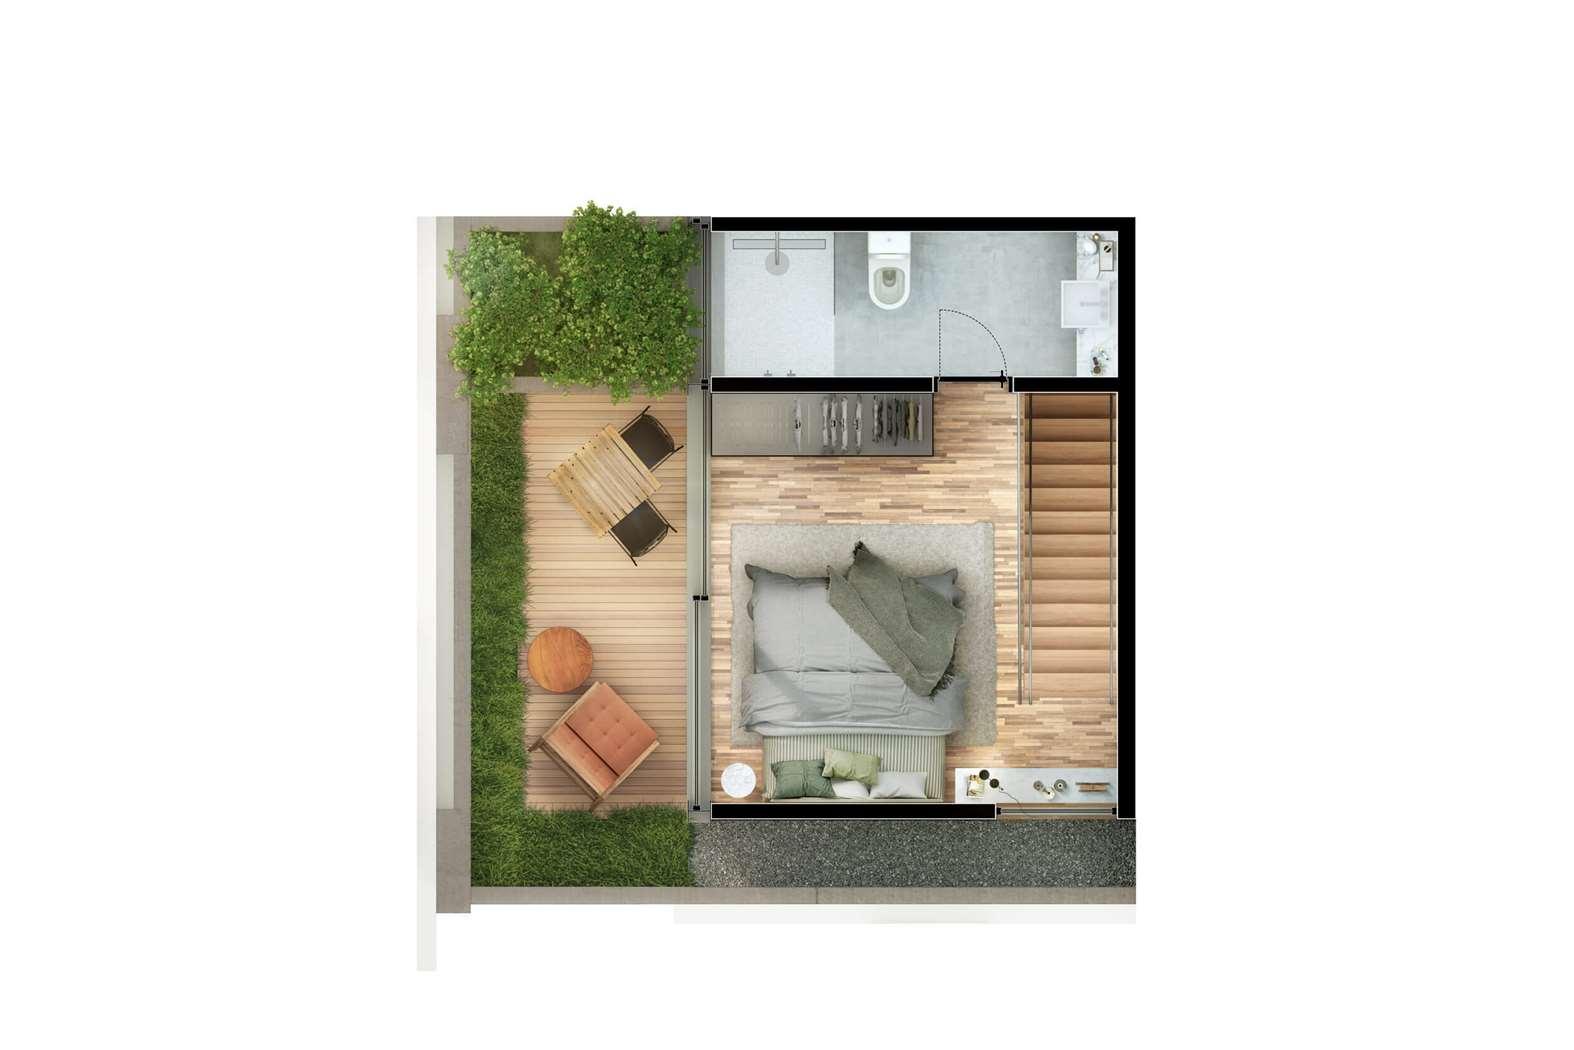 Cobertura Duplex 2 Suítes  81m² Pavimento Superior